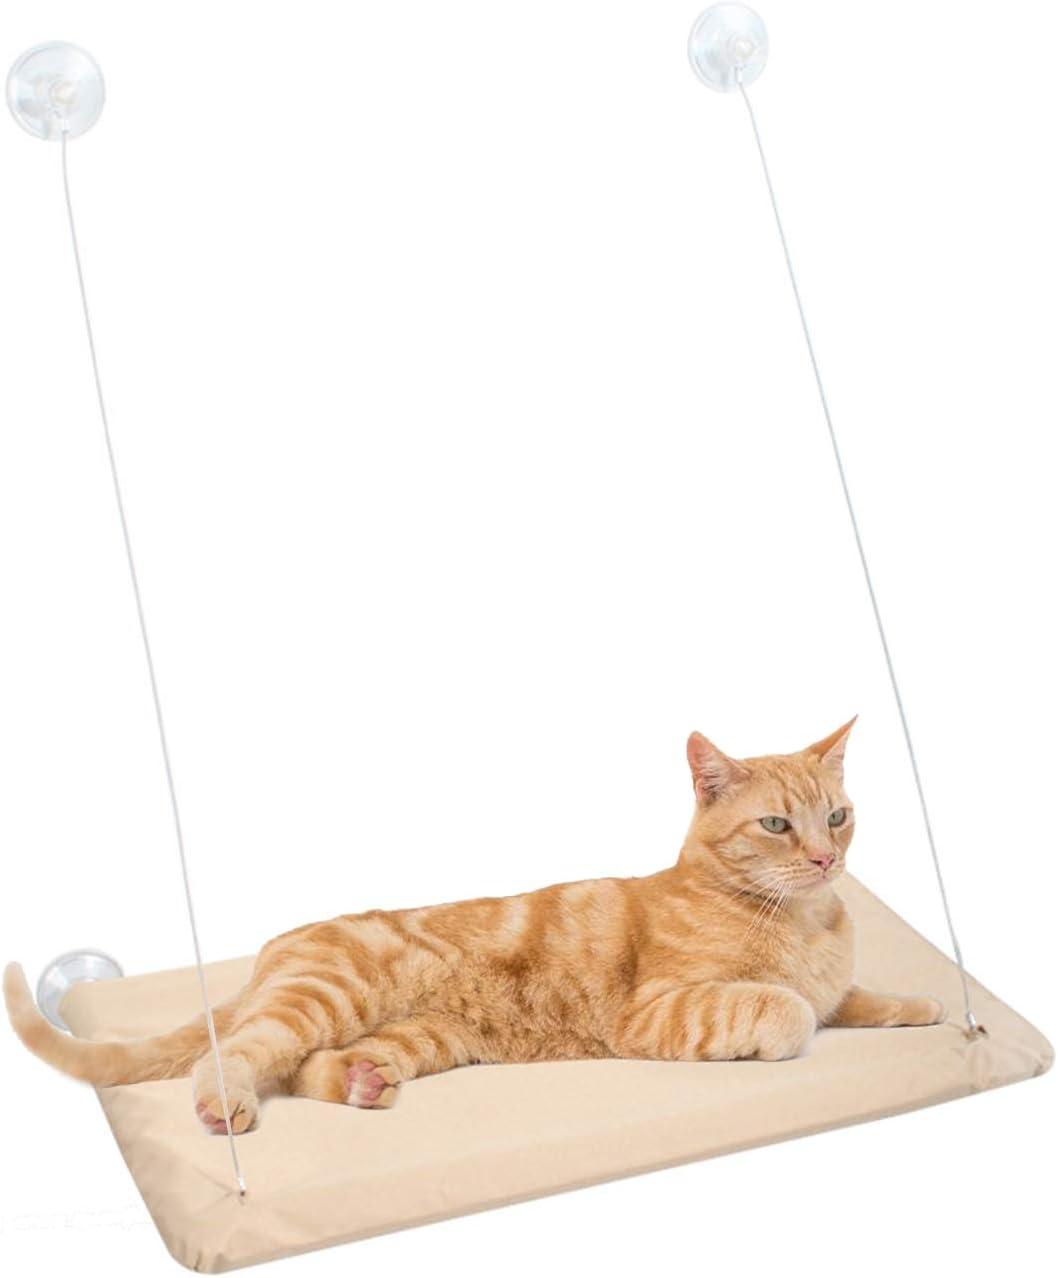 Gwotfy Cama para Gatos, Ventana para Gatos, Asiento de Percha, ventosas para Trabajo Pesado, Hamaca para Mascotas, Hamaca para Ventana para Gatos, Percha, Cama para Gatos, Capacidad para hasta 30 kg